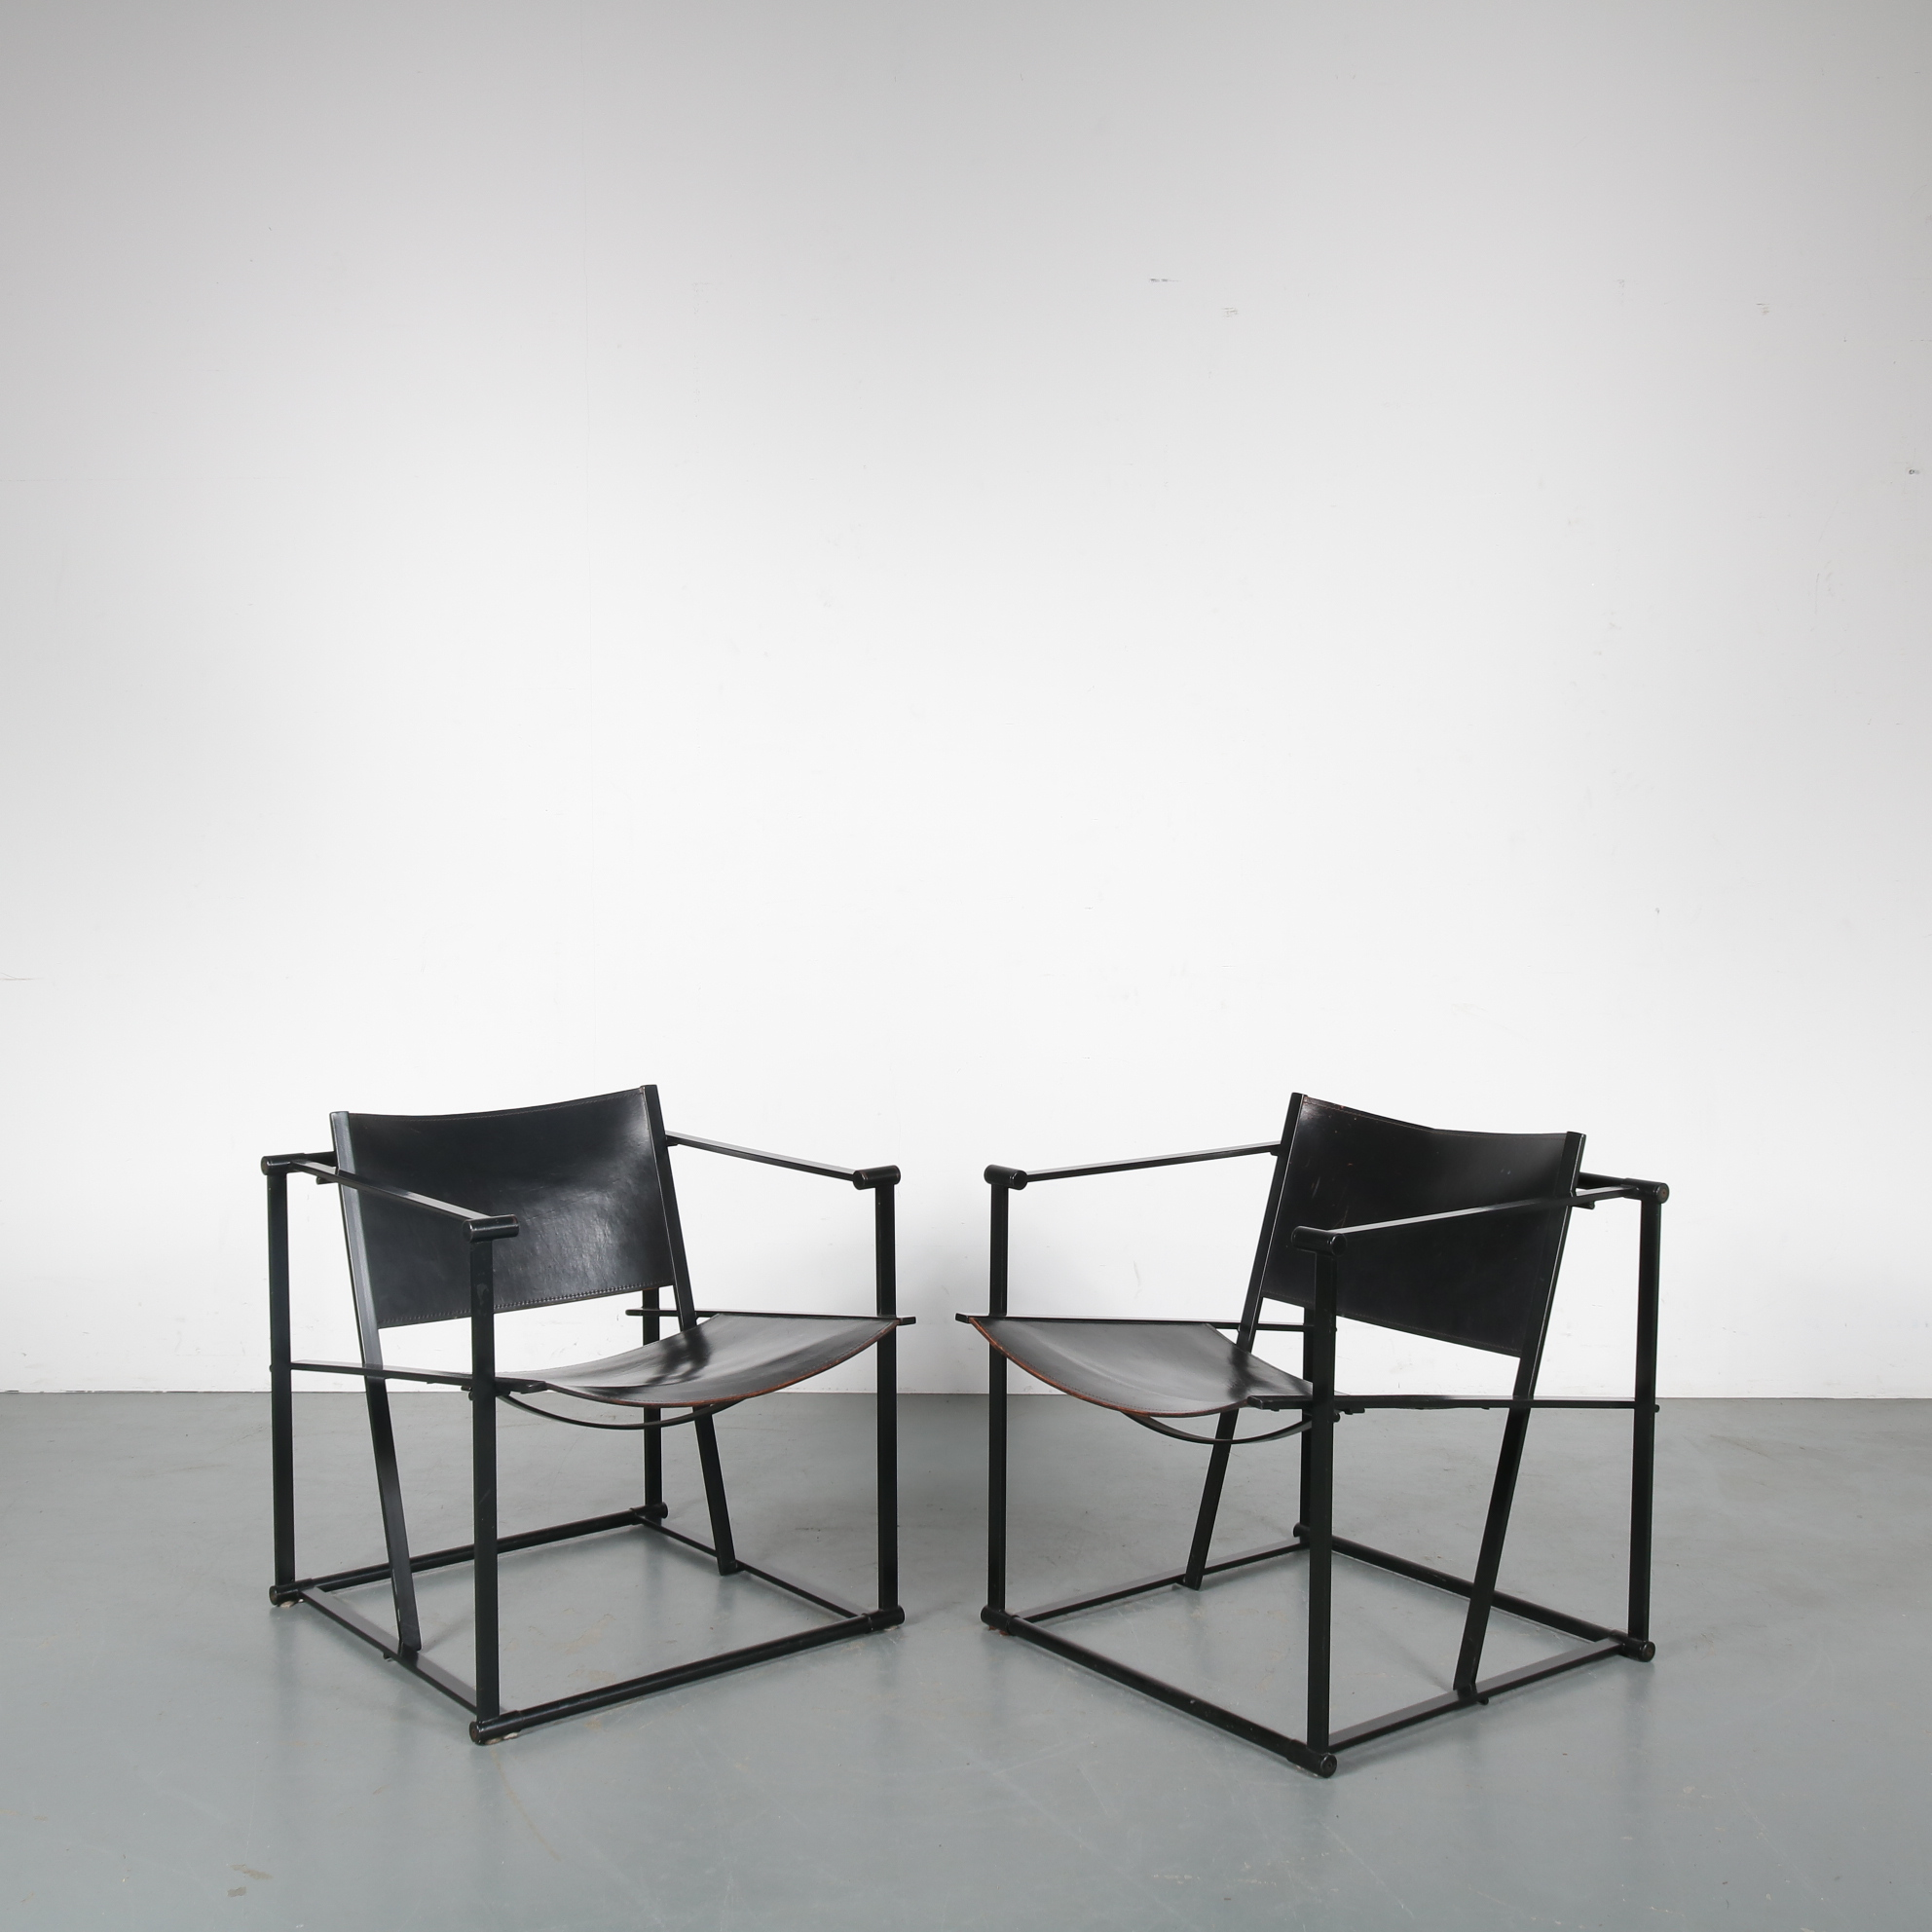 "m23823 1980s Set of 2 FM62 ""cube"" easy chair on black metal frame with black saddle leather upholstery Radboud van Beekum Pastoe / Netherlands"